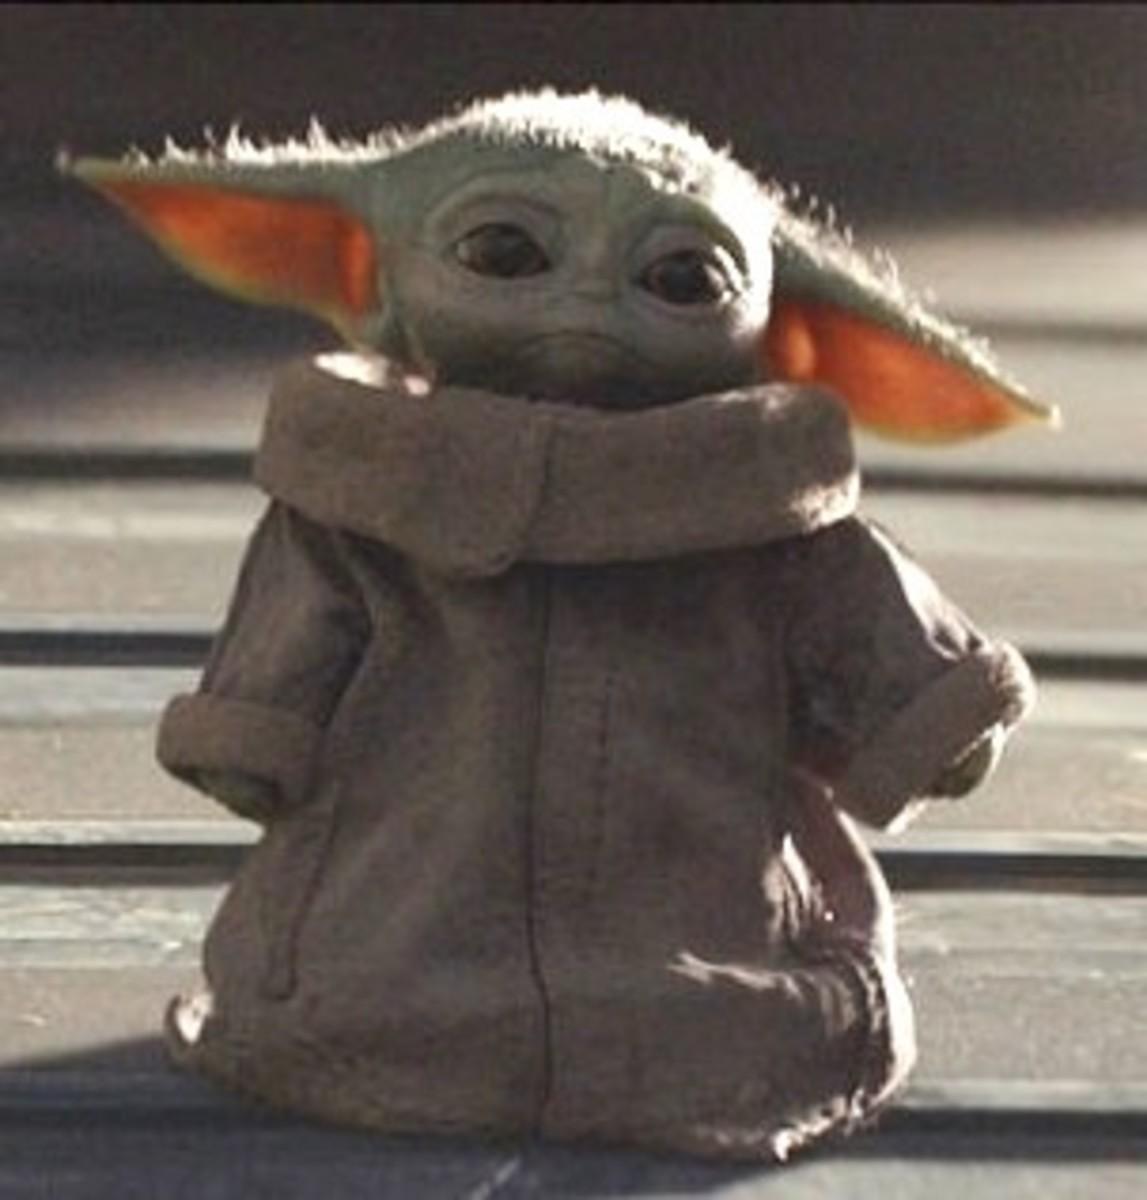 Baby Yoda, or Grogu, from The Mandalorian.